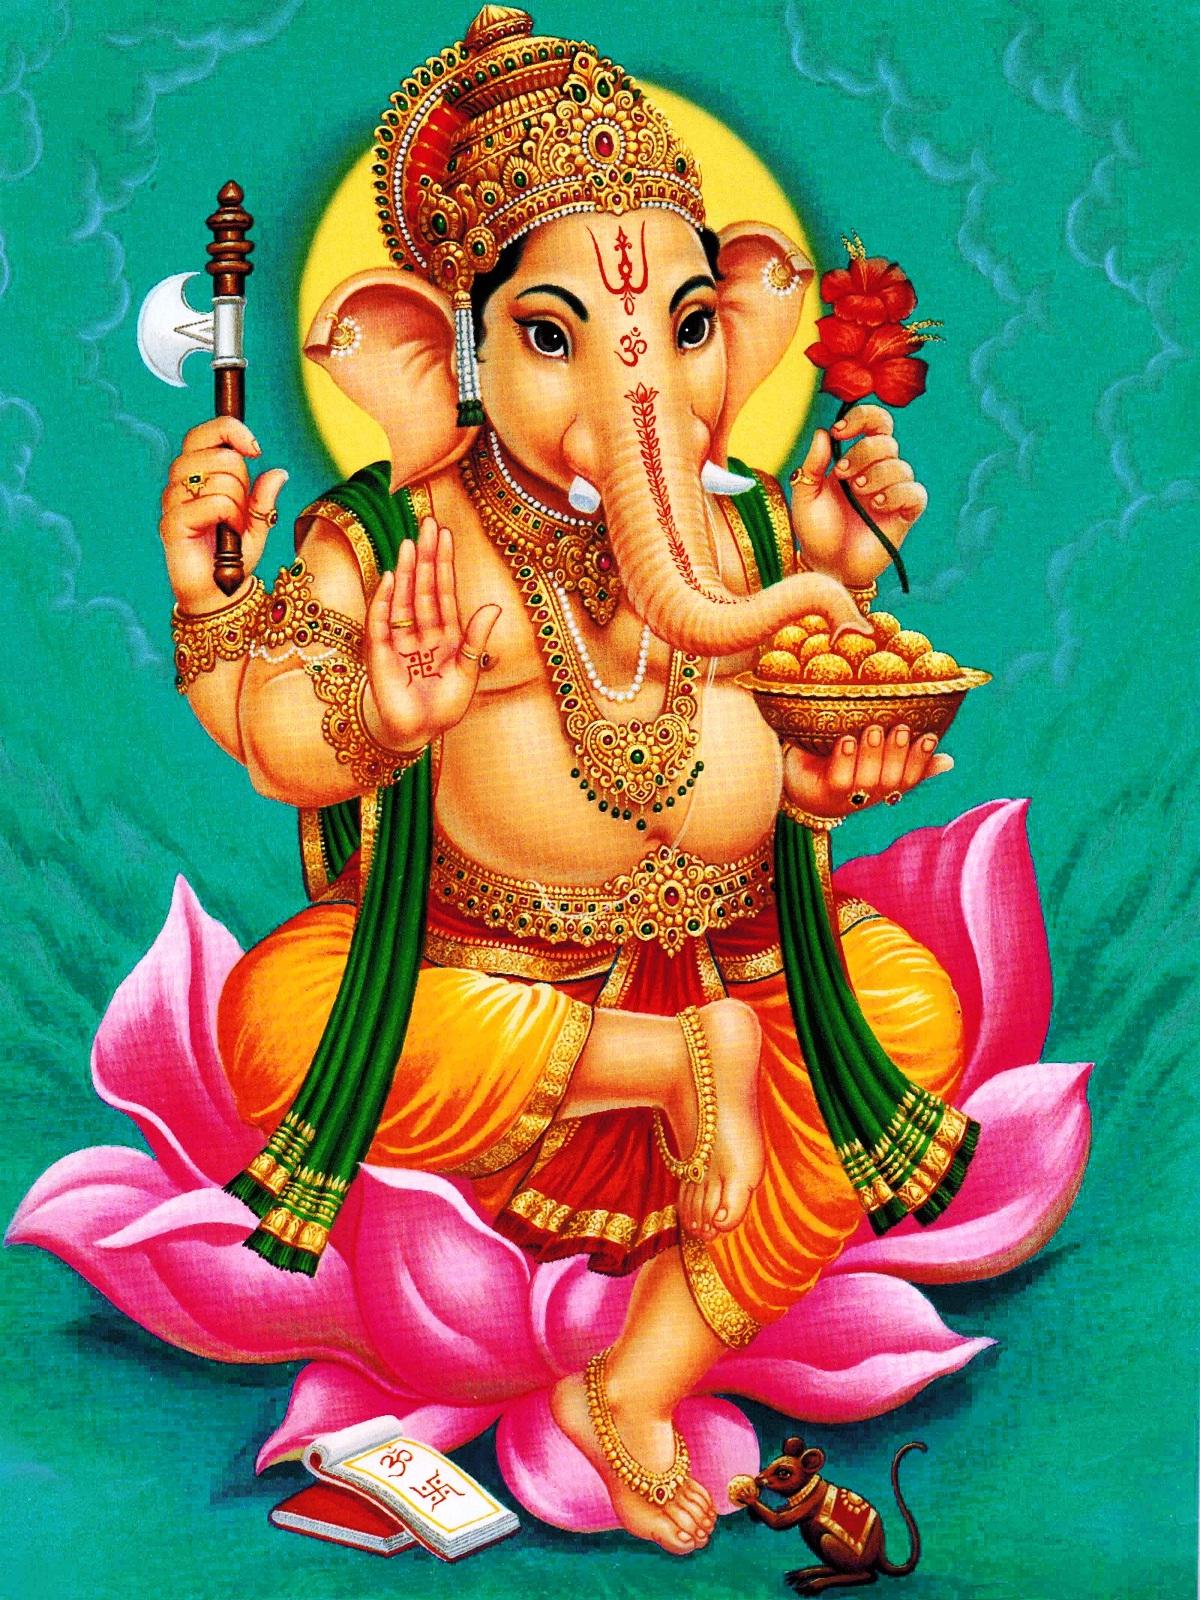 Wallpaper download karna hai - Lord Ganesha Wallpaper Free Download